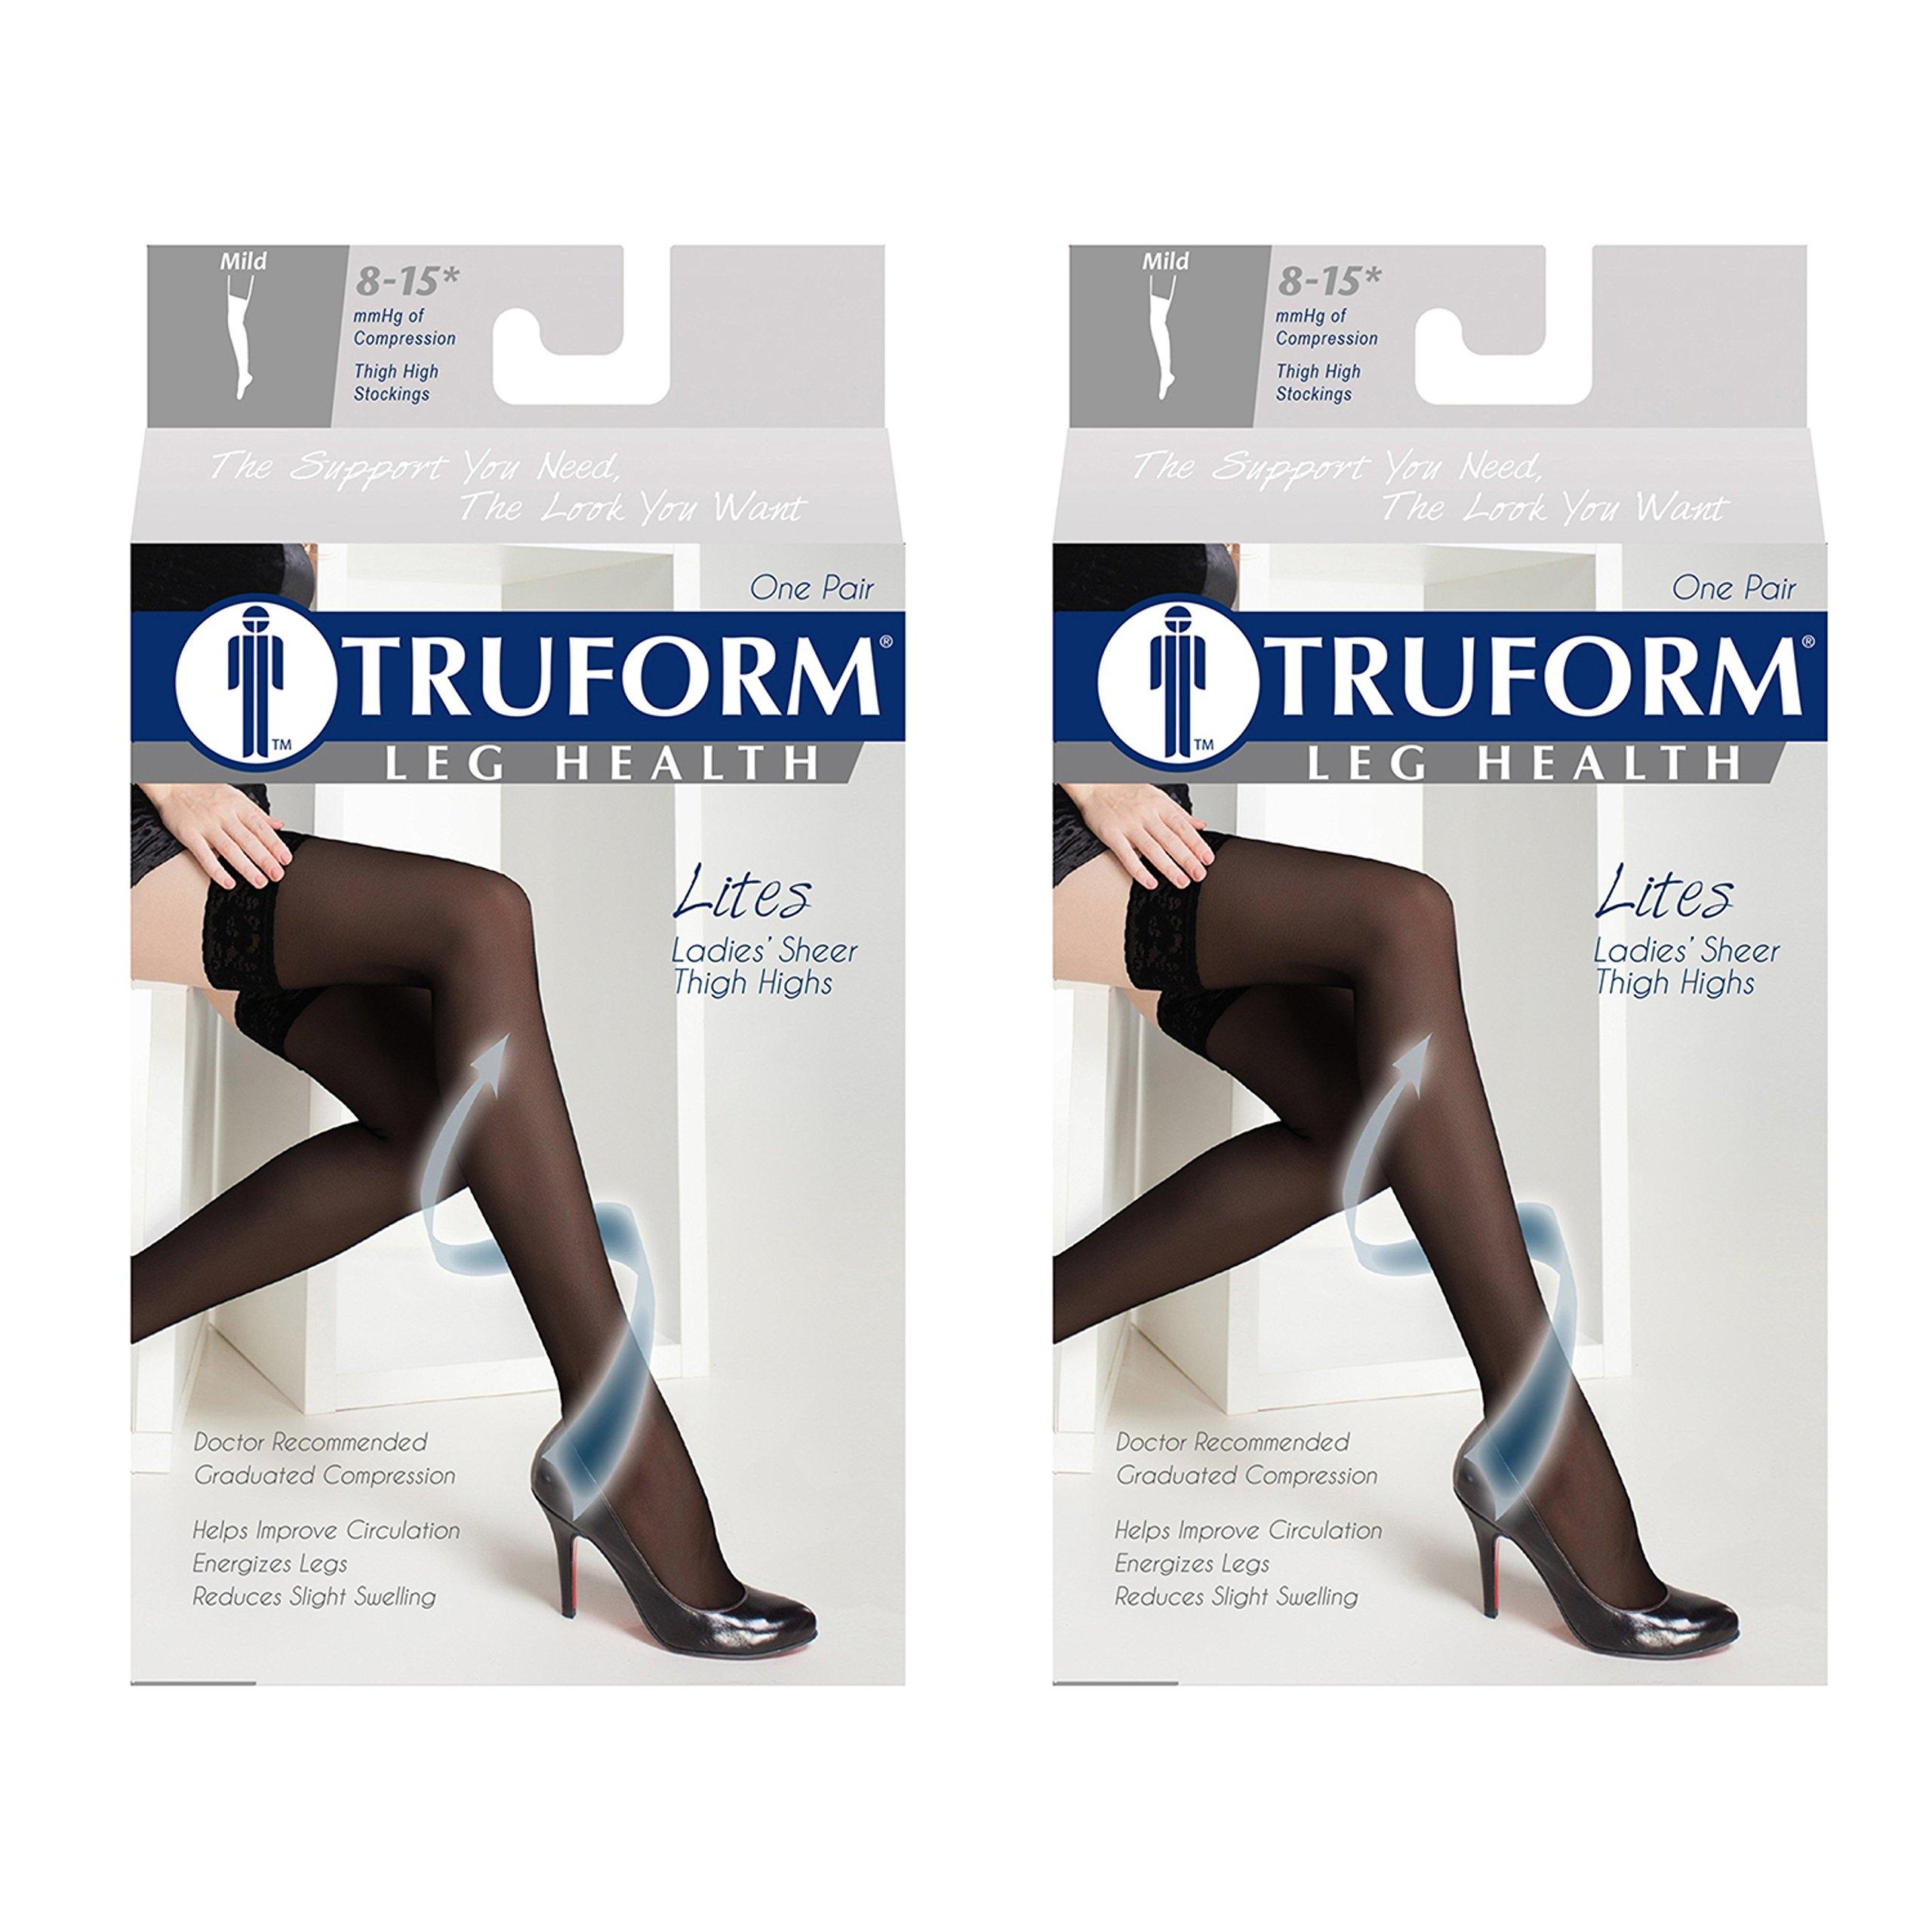 Truform Compression 8-15 mmHg Sheer Thigh High Stockings Black, Medium, 2 Count